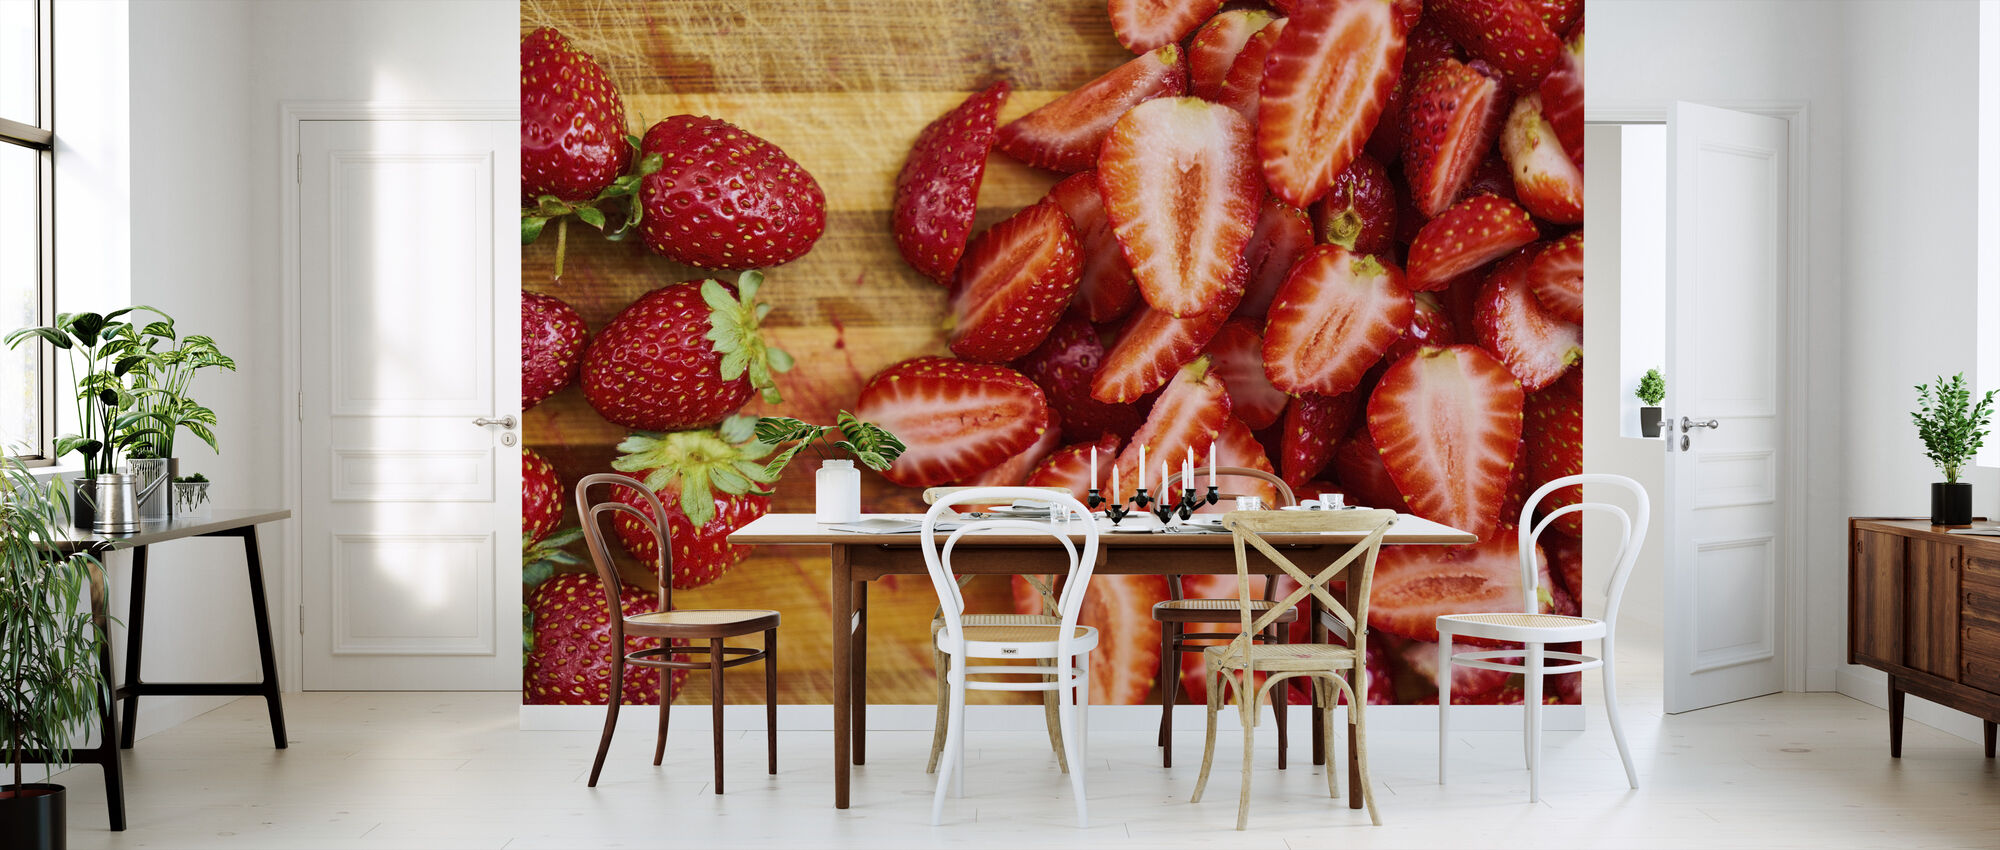 Strawberry Fruits - Wallpaper - Kitchen